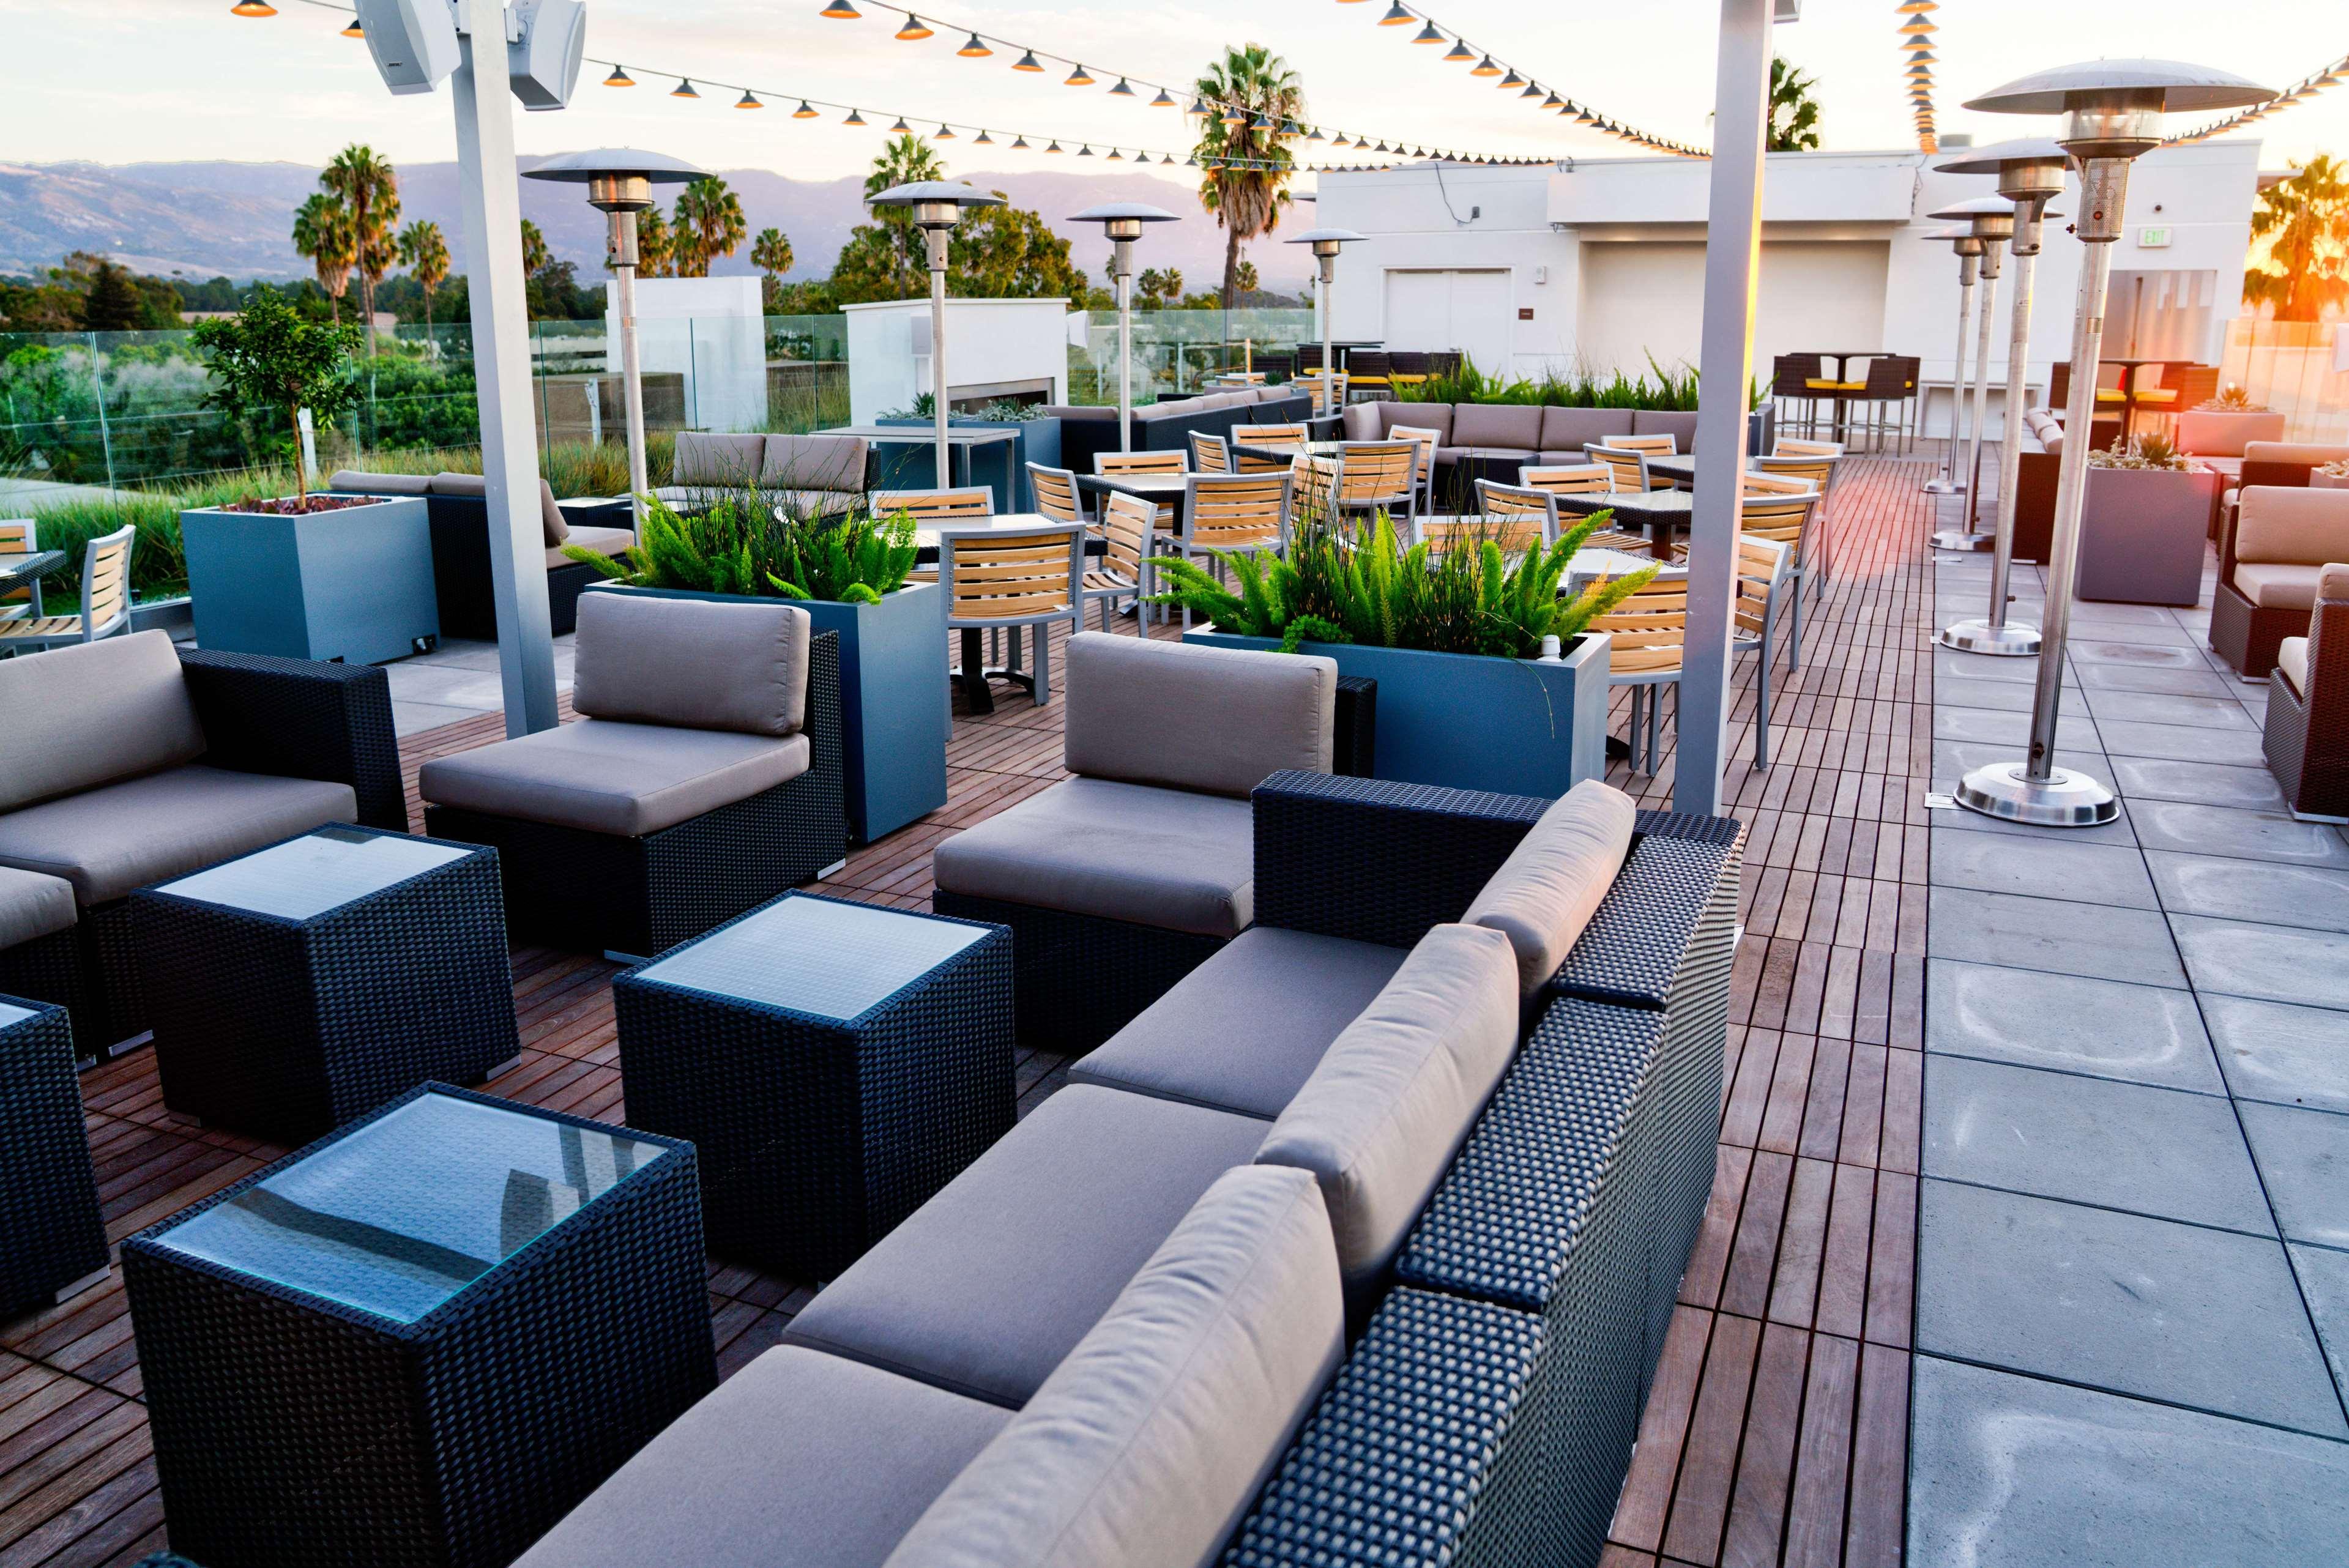 Hilton Garden Inn Santa Barbara/Goleta image 2